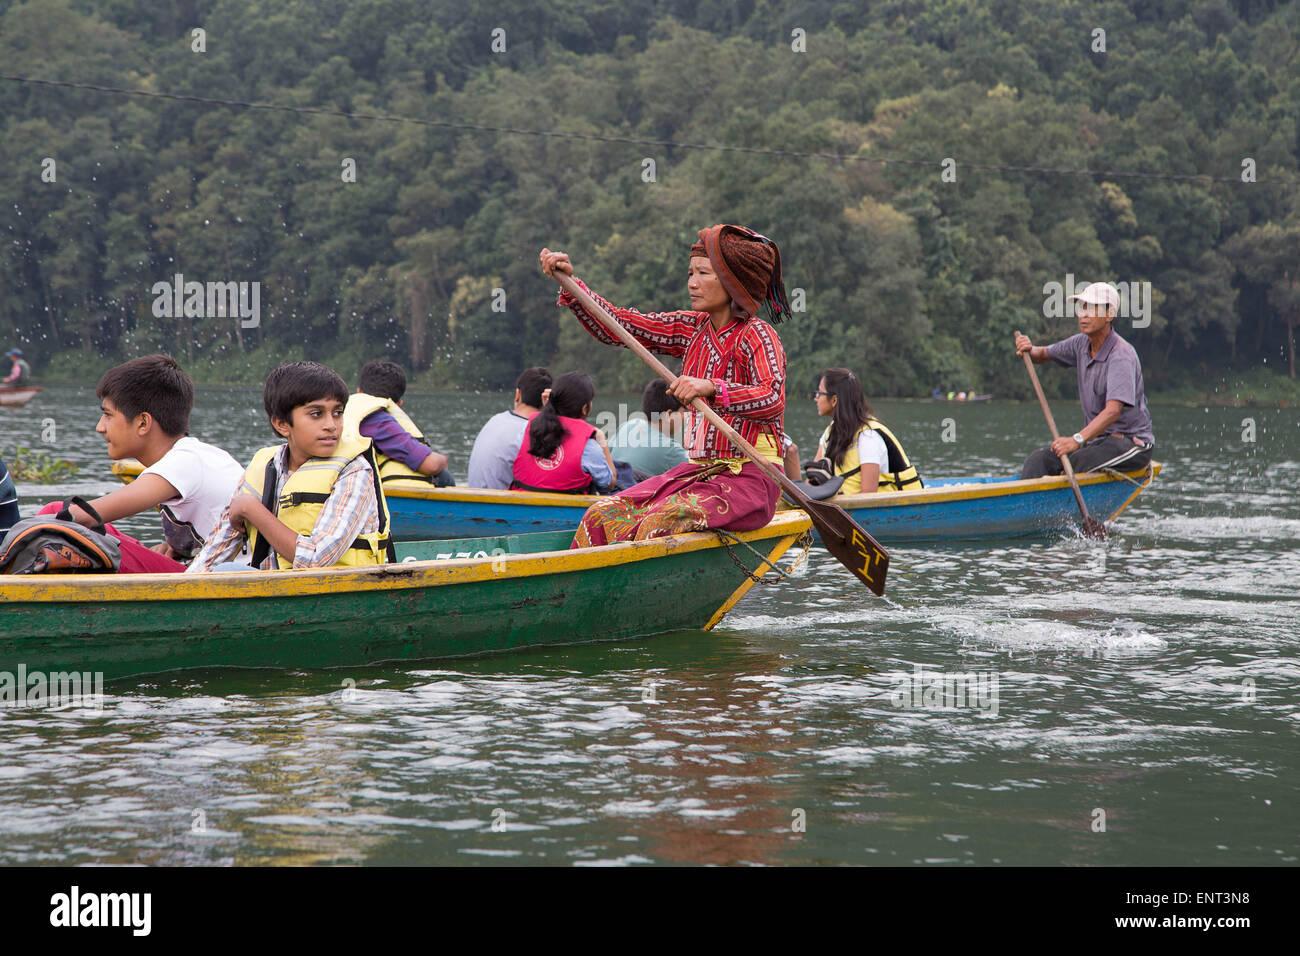 Rowing Across Pokhara Lake, Nepal - Stock Image